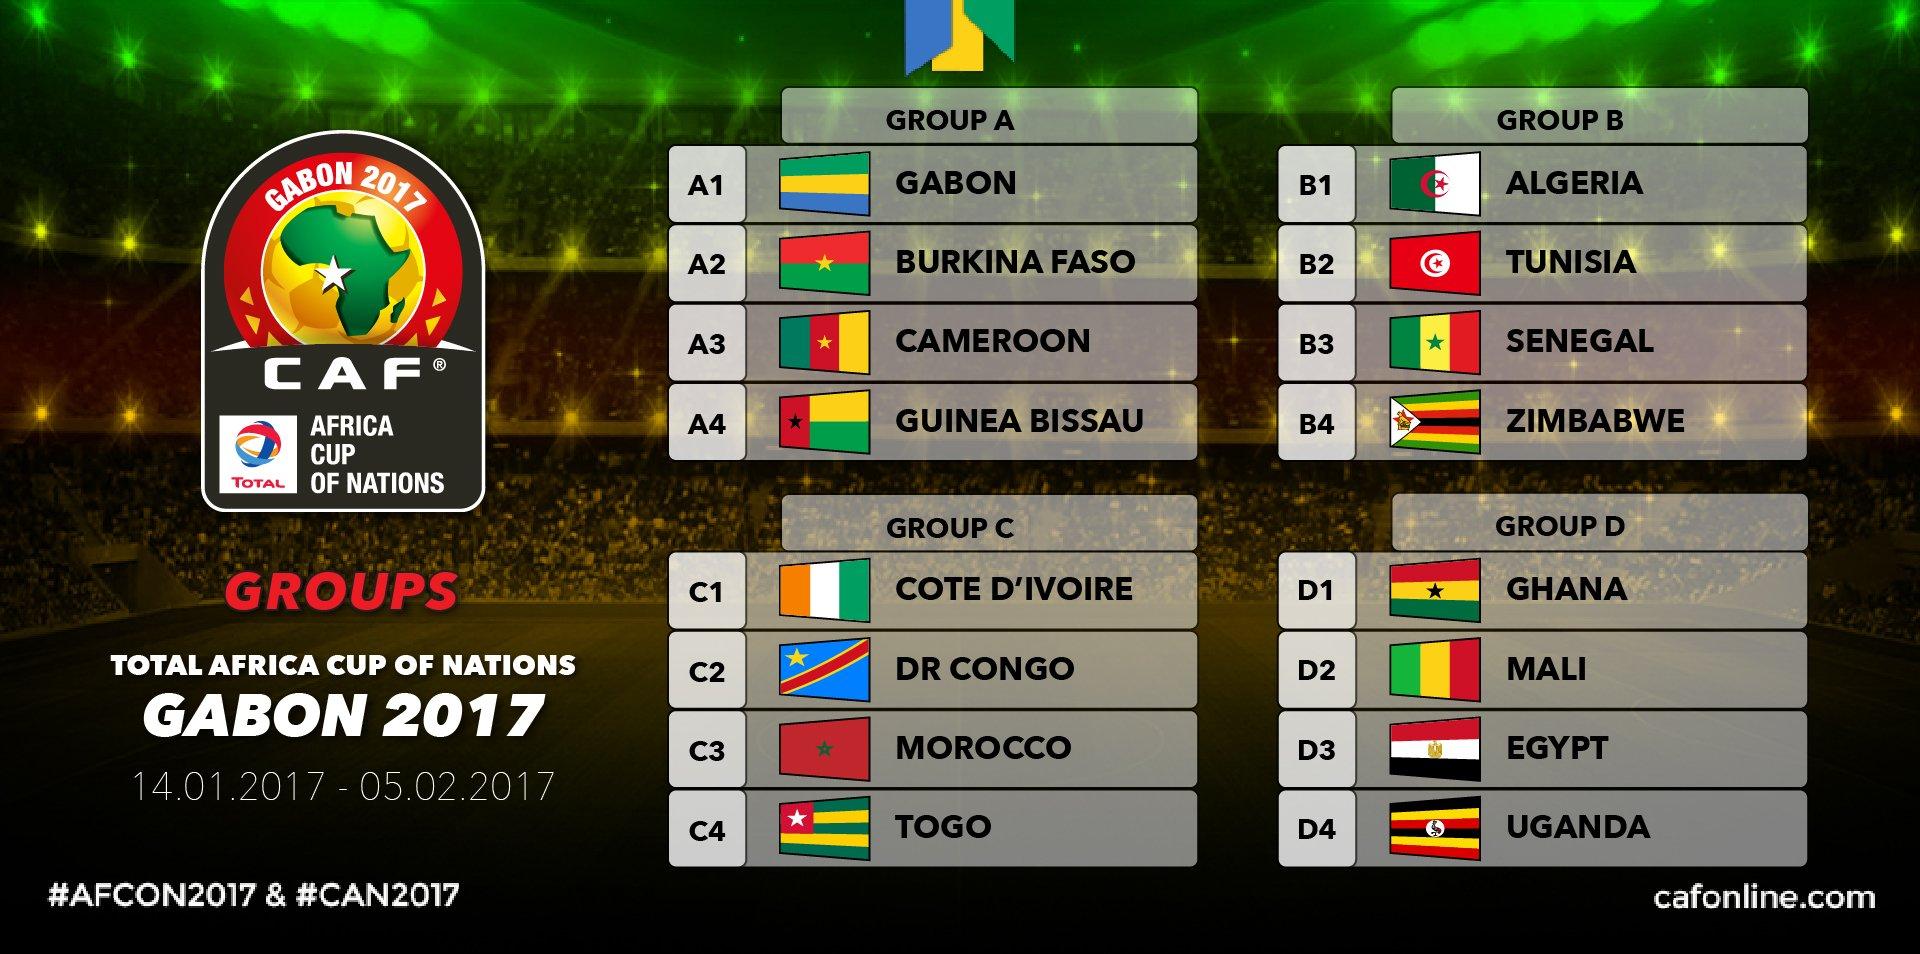 Algeria, Senegal, Tunisia In 2017 AFCON Group Of Death